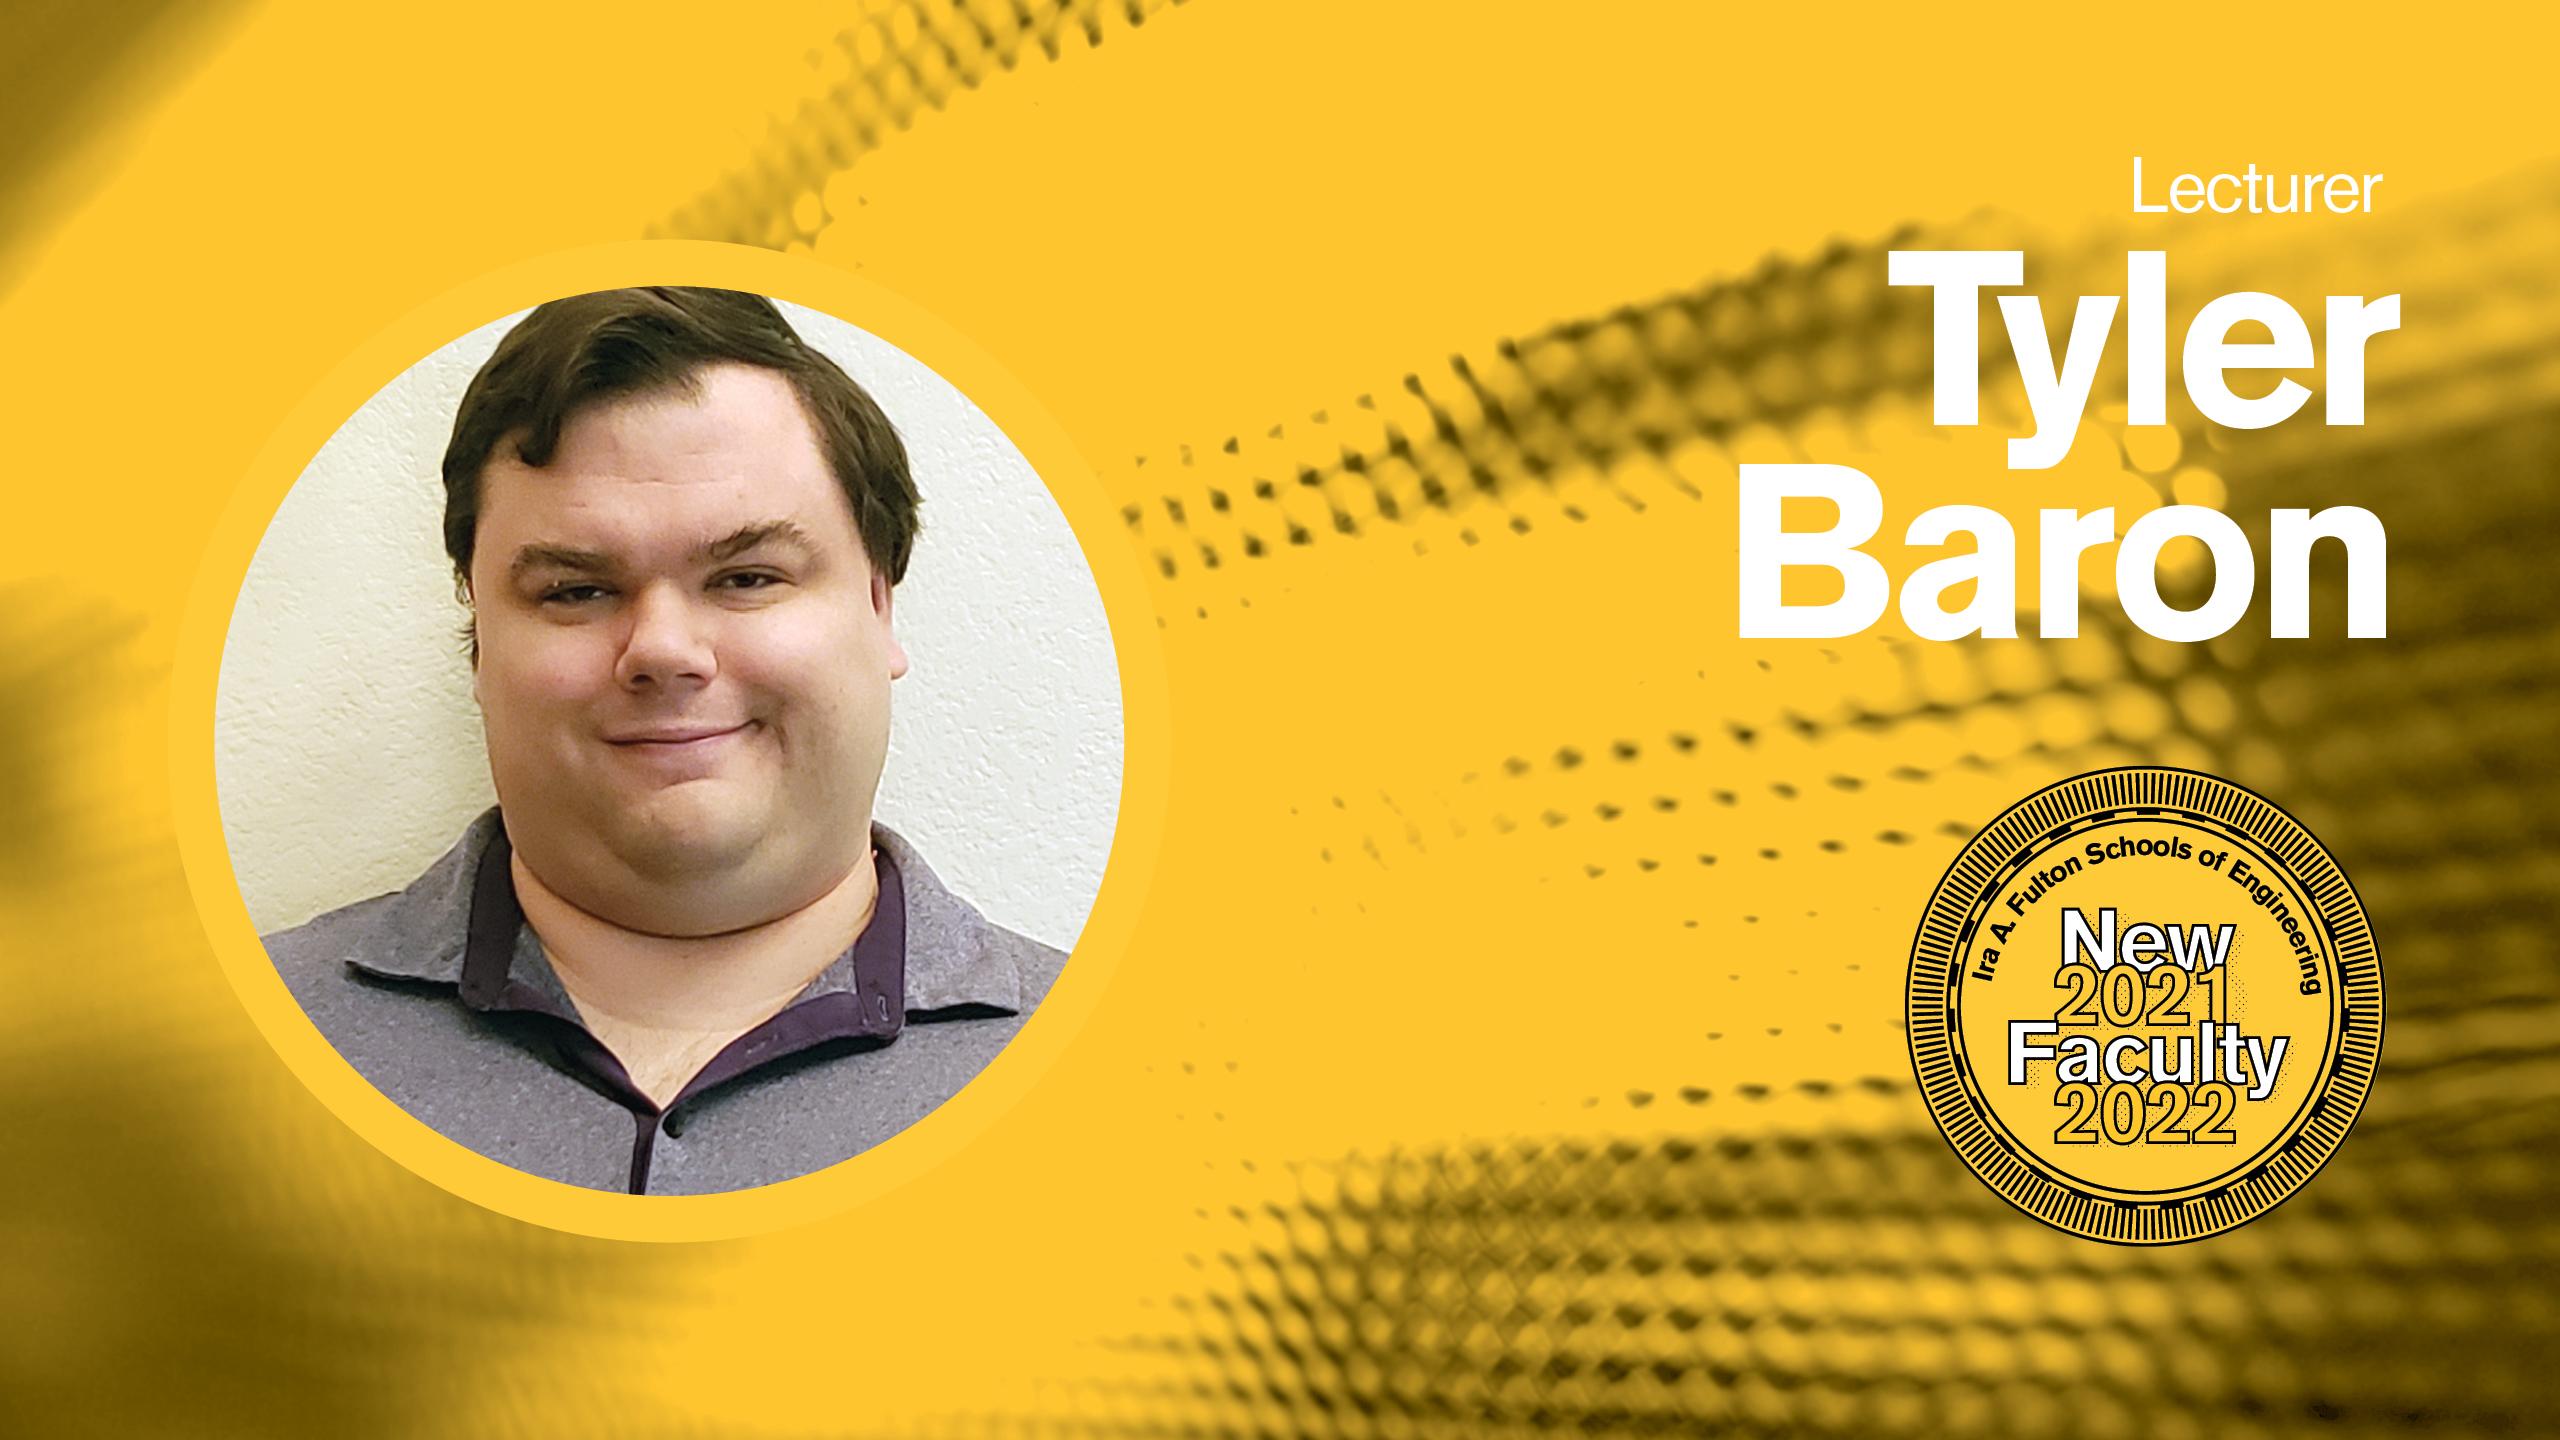 Tyler Baron